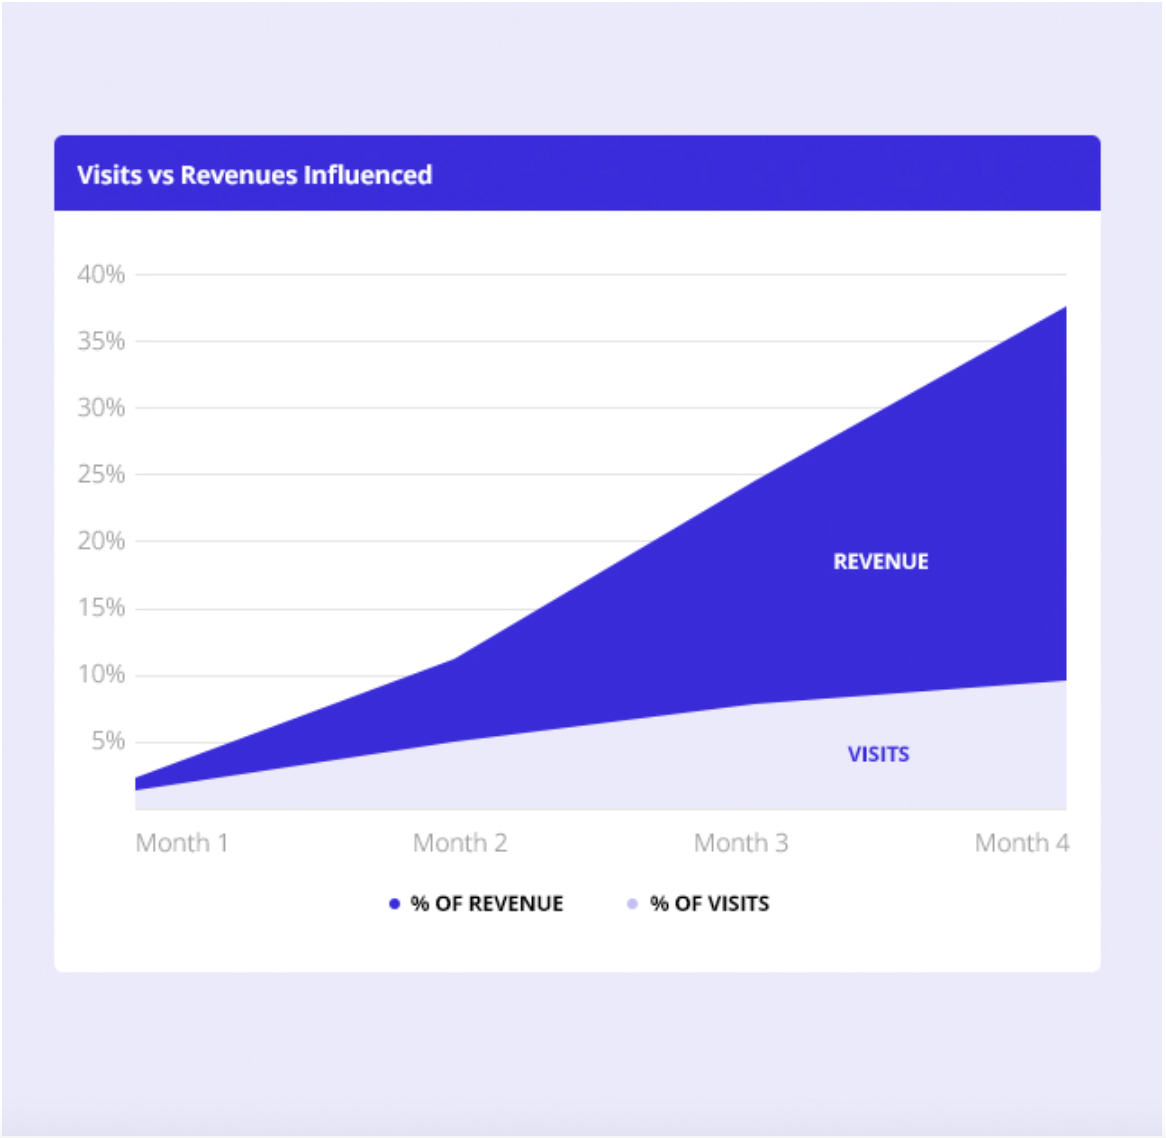 visits-vs-revenues